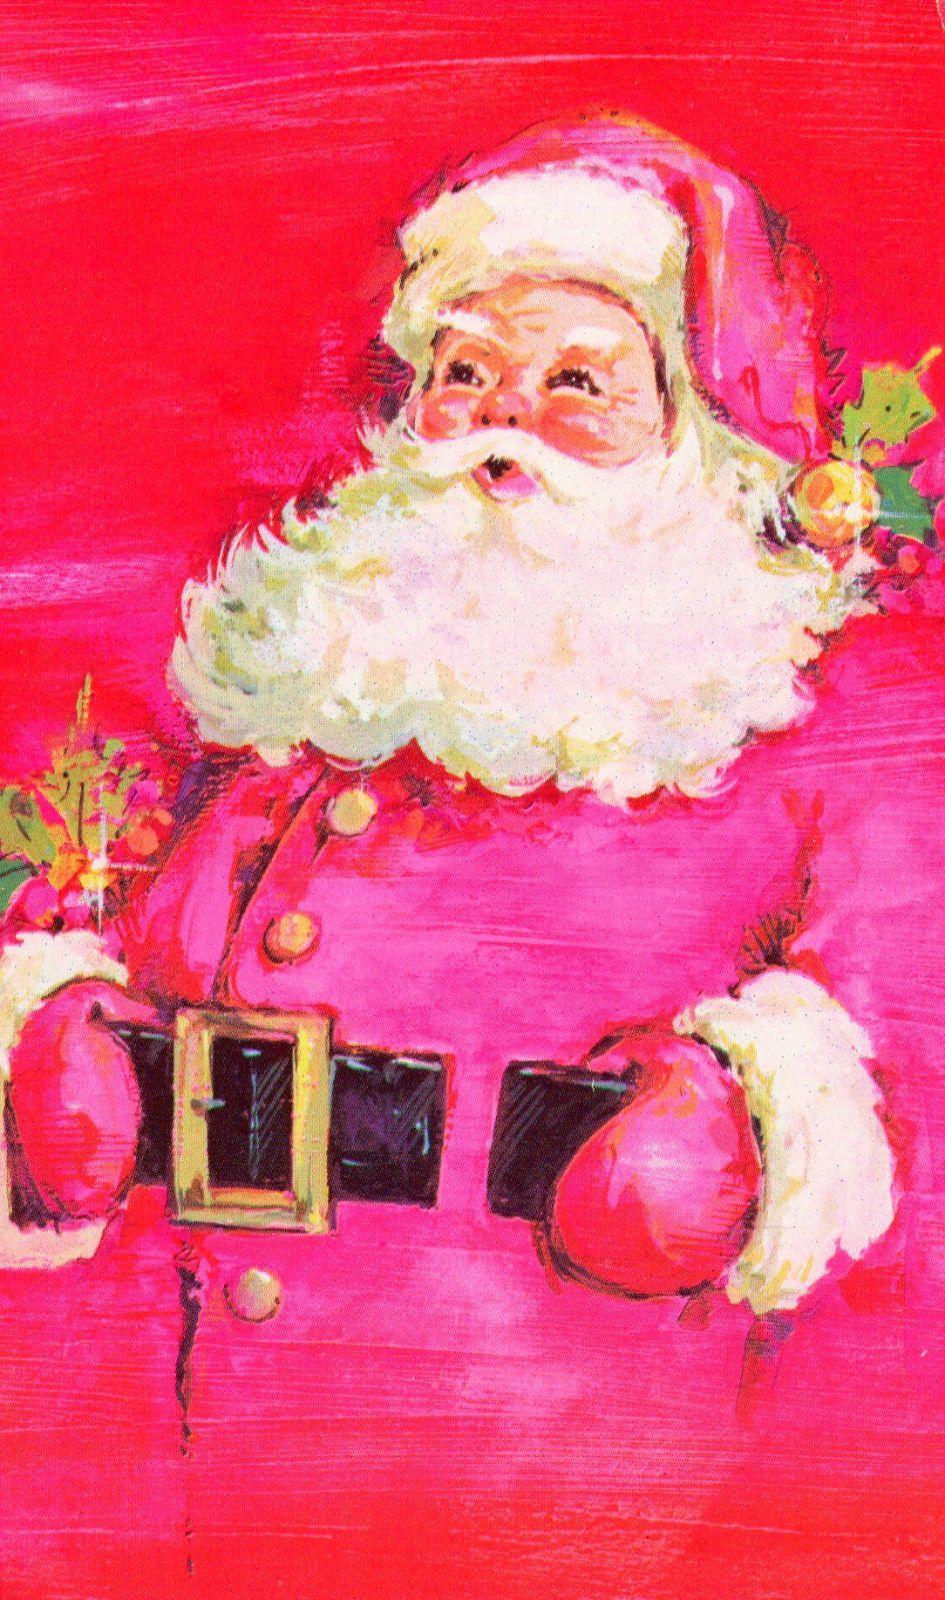 vintage christmas card santa claus with pink tones ebay. Black Bedroom Furniture Sets. Home Design Ideas